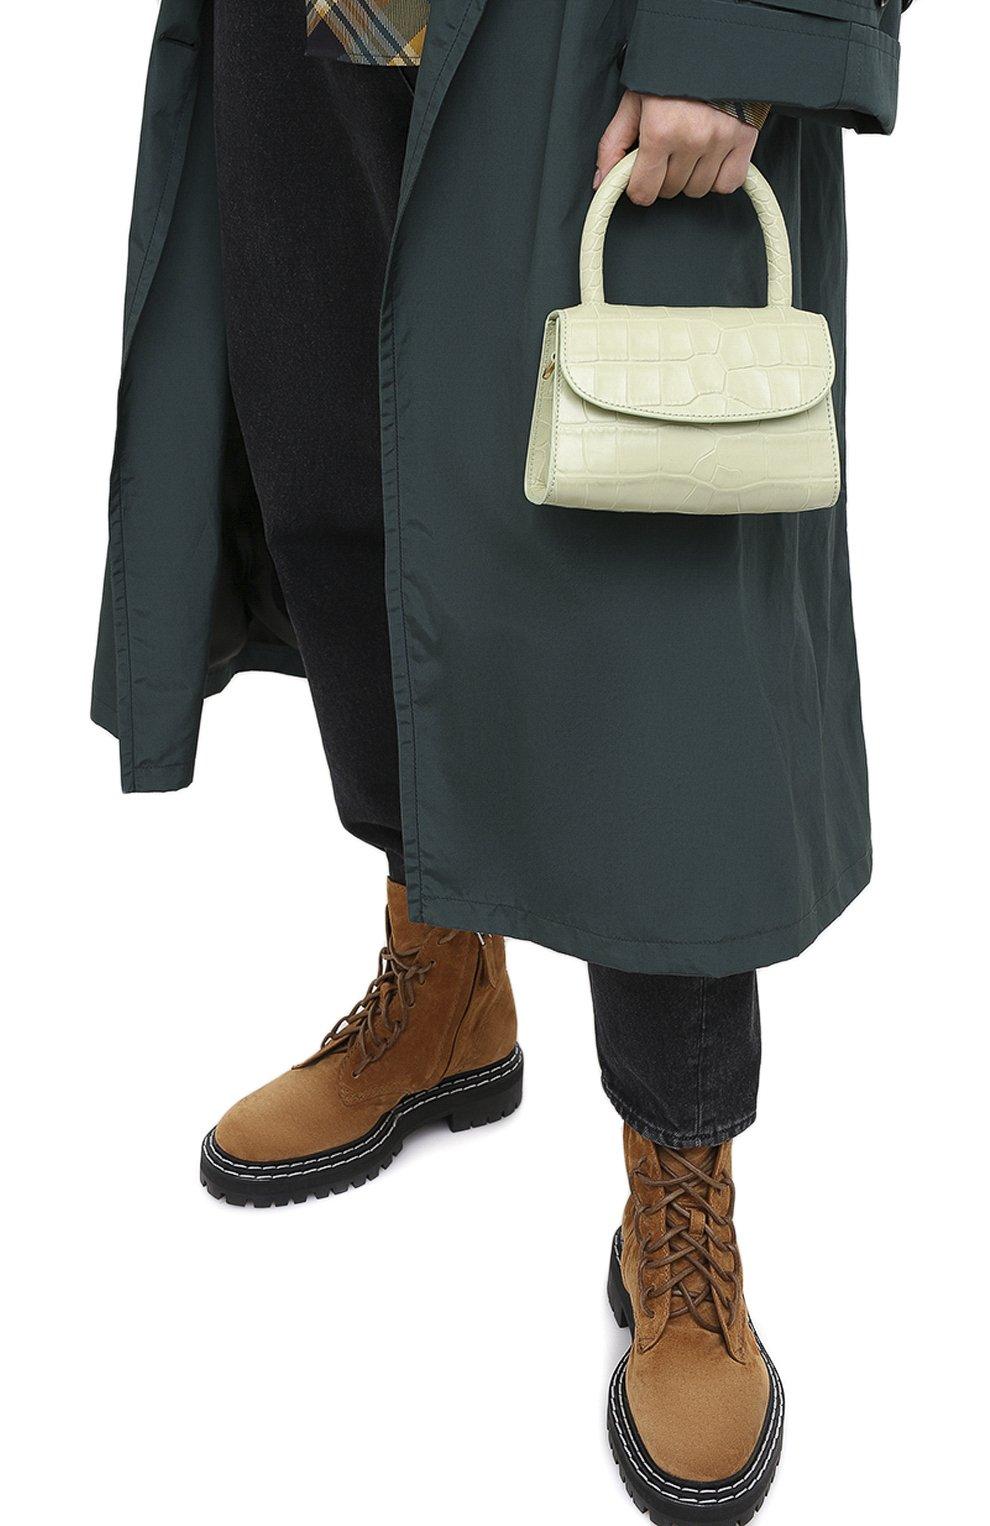 Женская сумка mini BY FAR светло-зеленого цвета, арт. 18FWMINASGDSMA | Фото 2 (Сумки-технические: Сумки через плечо, Сумки top-handle; Материал: Натуральная кожа; Размер: mini; Ремень/цепочка: На ремешке)